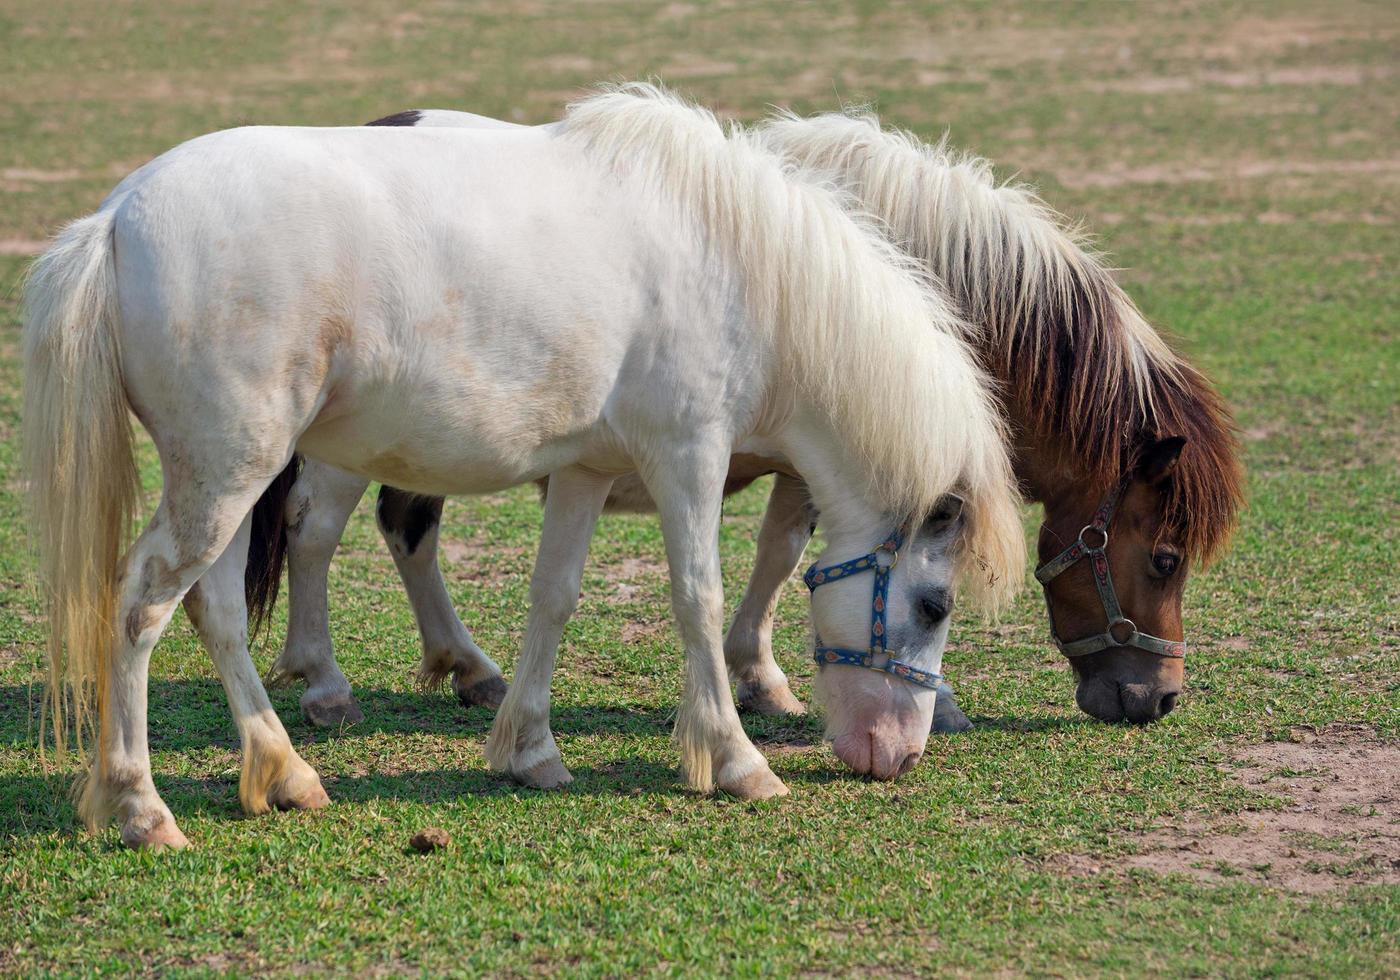 dwerg paarden rusten op gras. foto